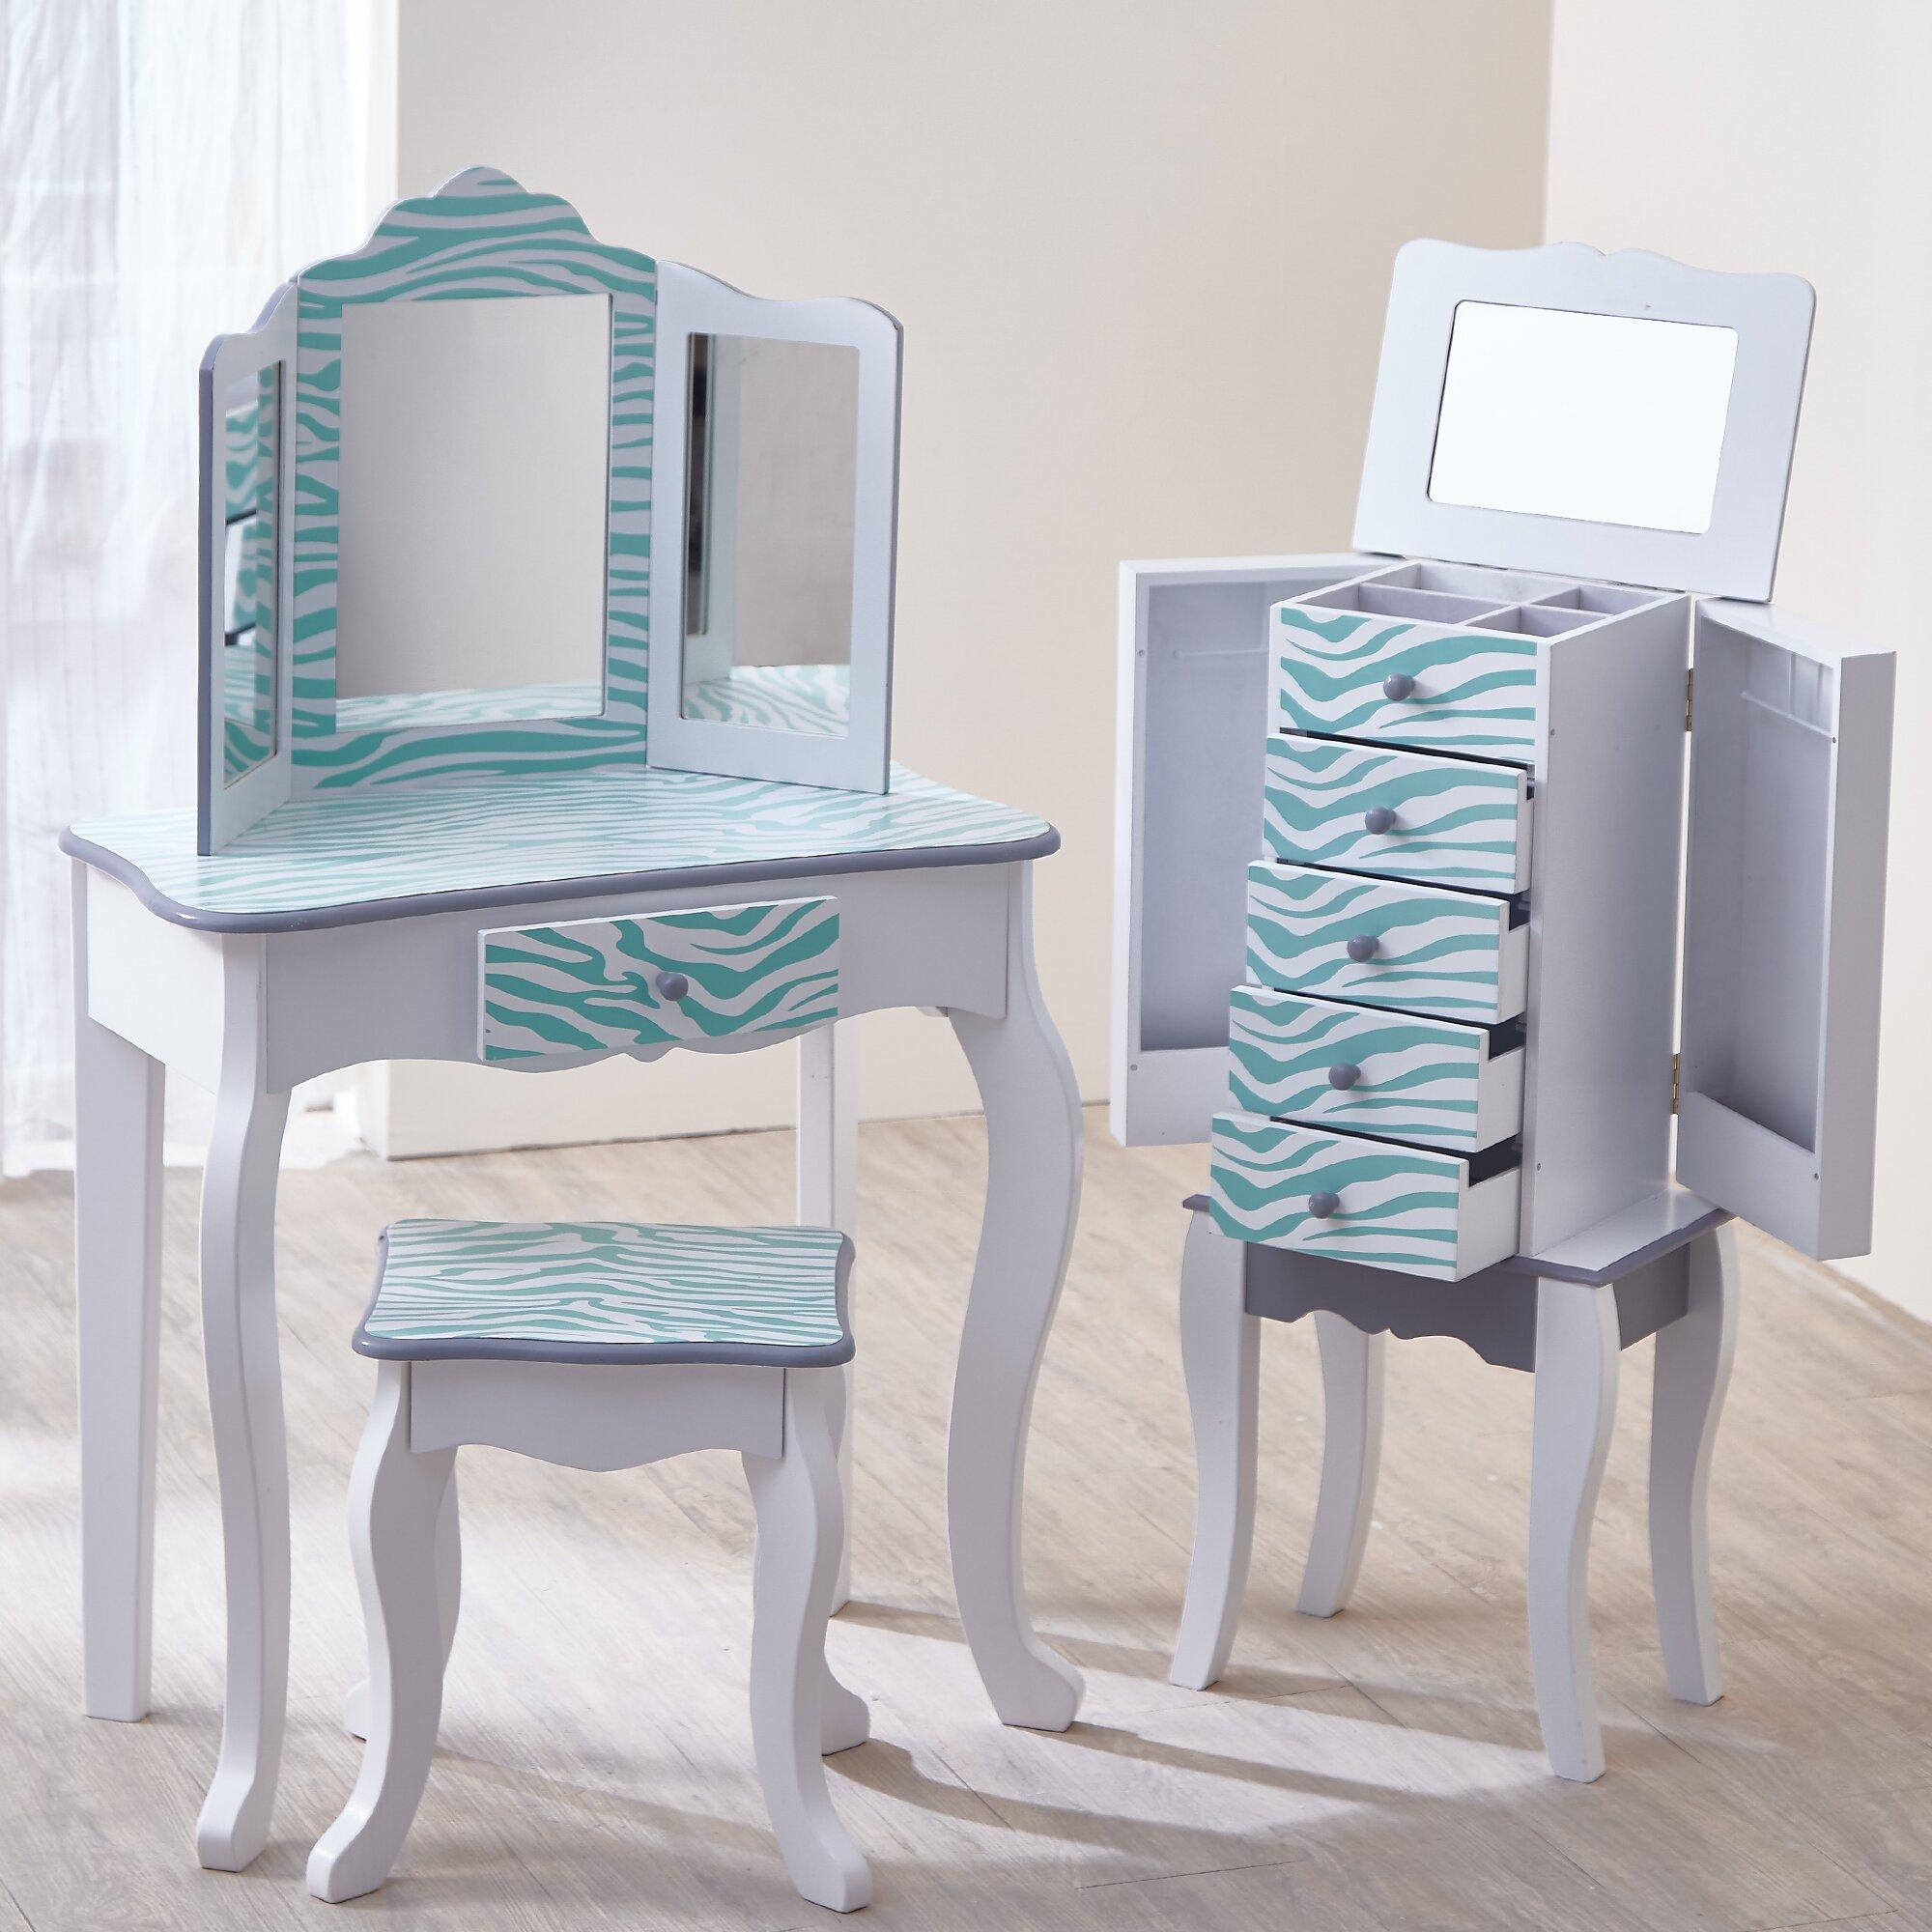 Teamson Kids Fashion Prints Vanity Set With Mirror